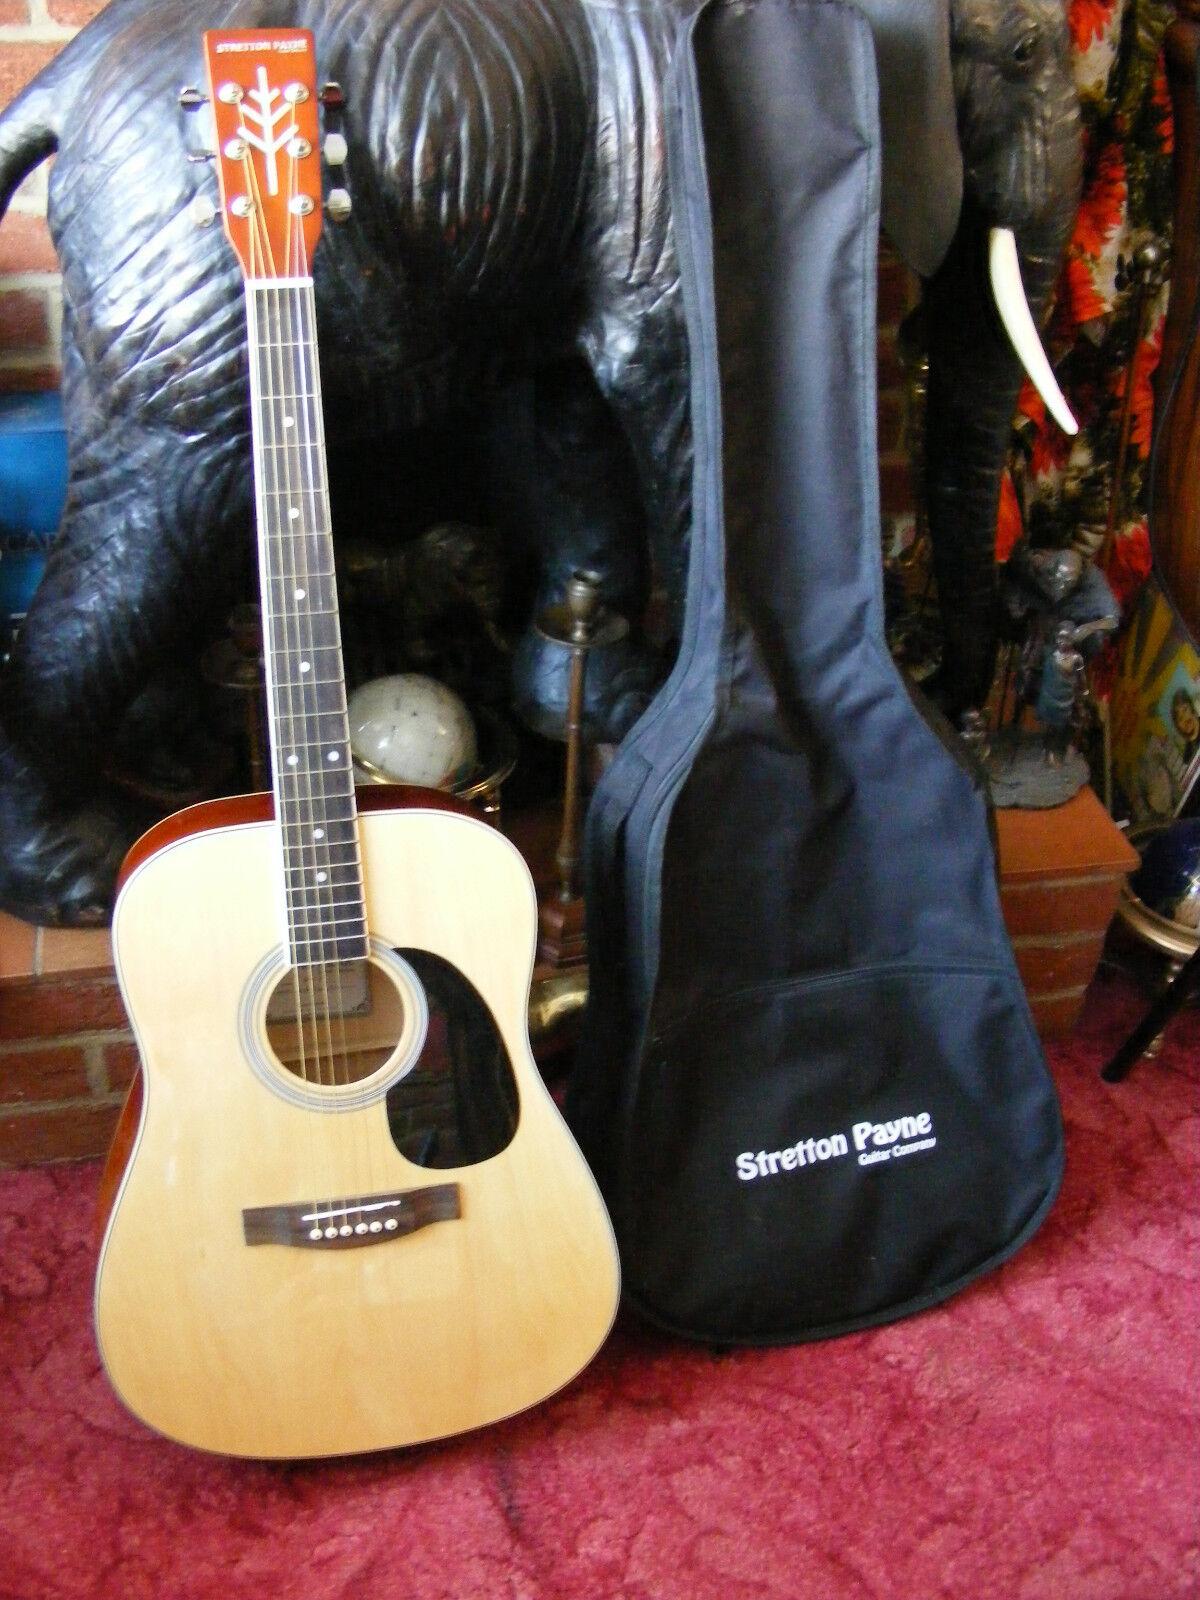 Stretton Payne Right Handed 6 String Acoustic Guitar Model SPD1 D1 Original Bag